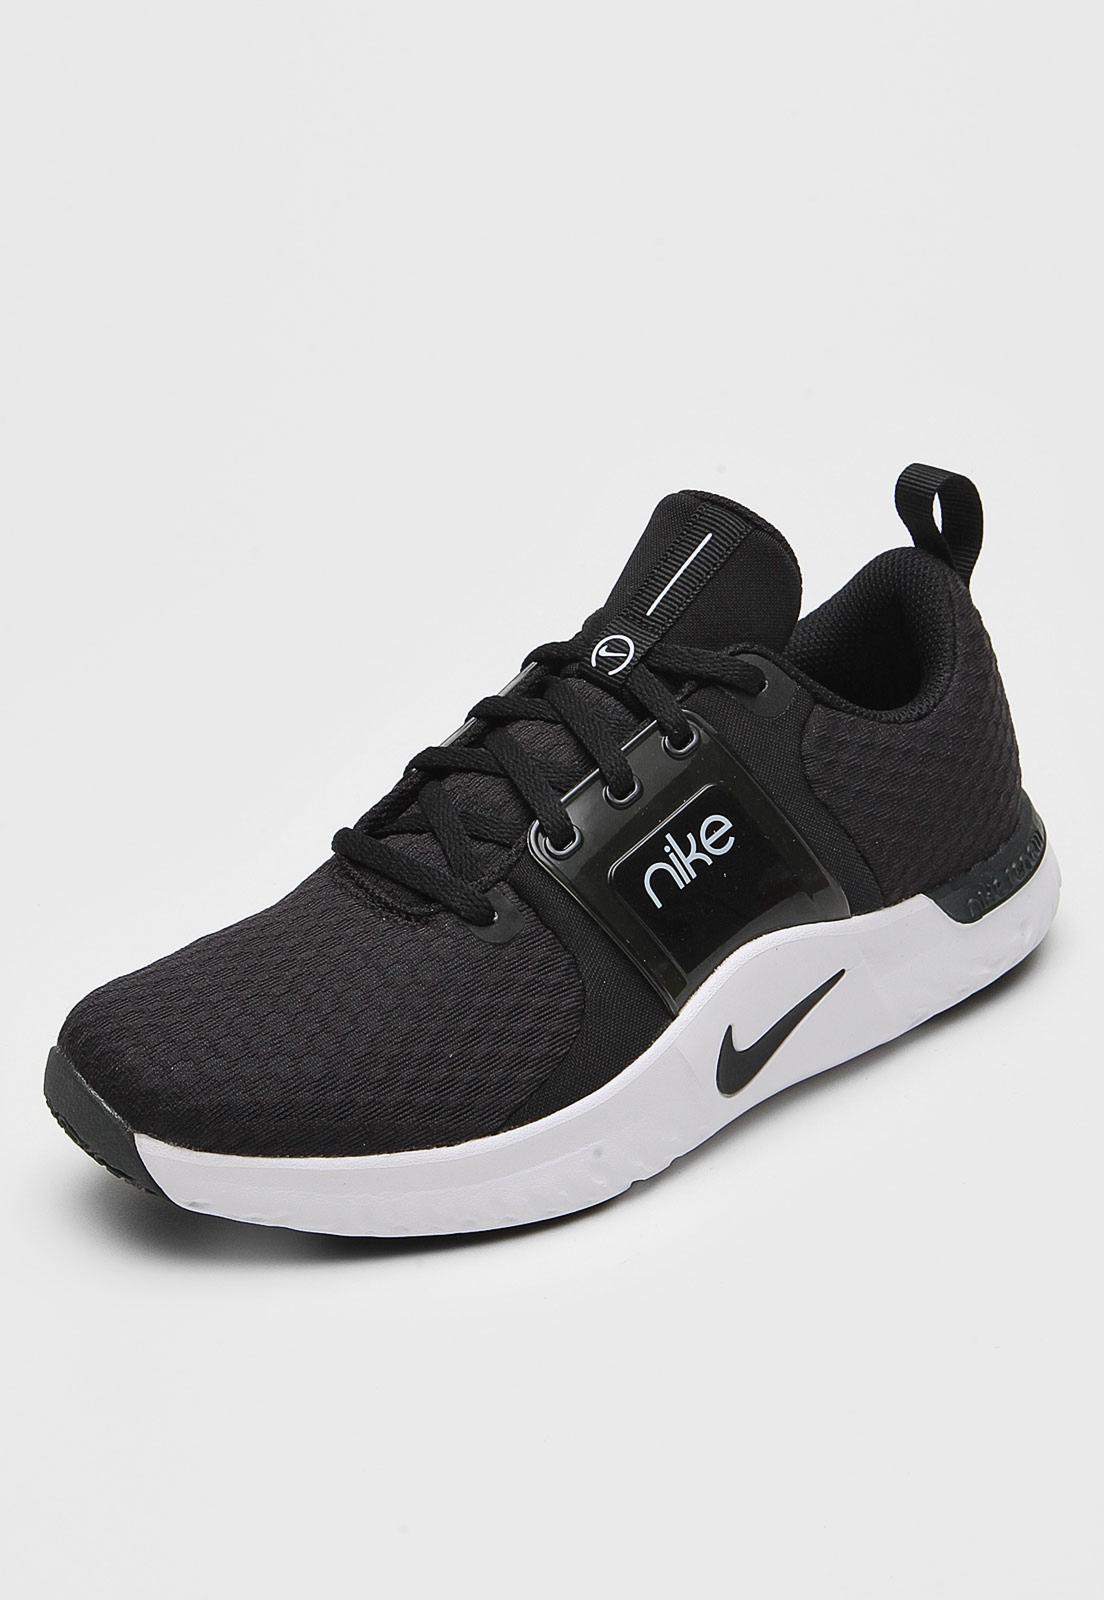 Tênis Nike Renew In-Season Tr 10 Preto/Branco